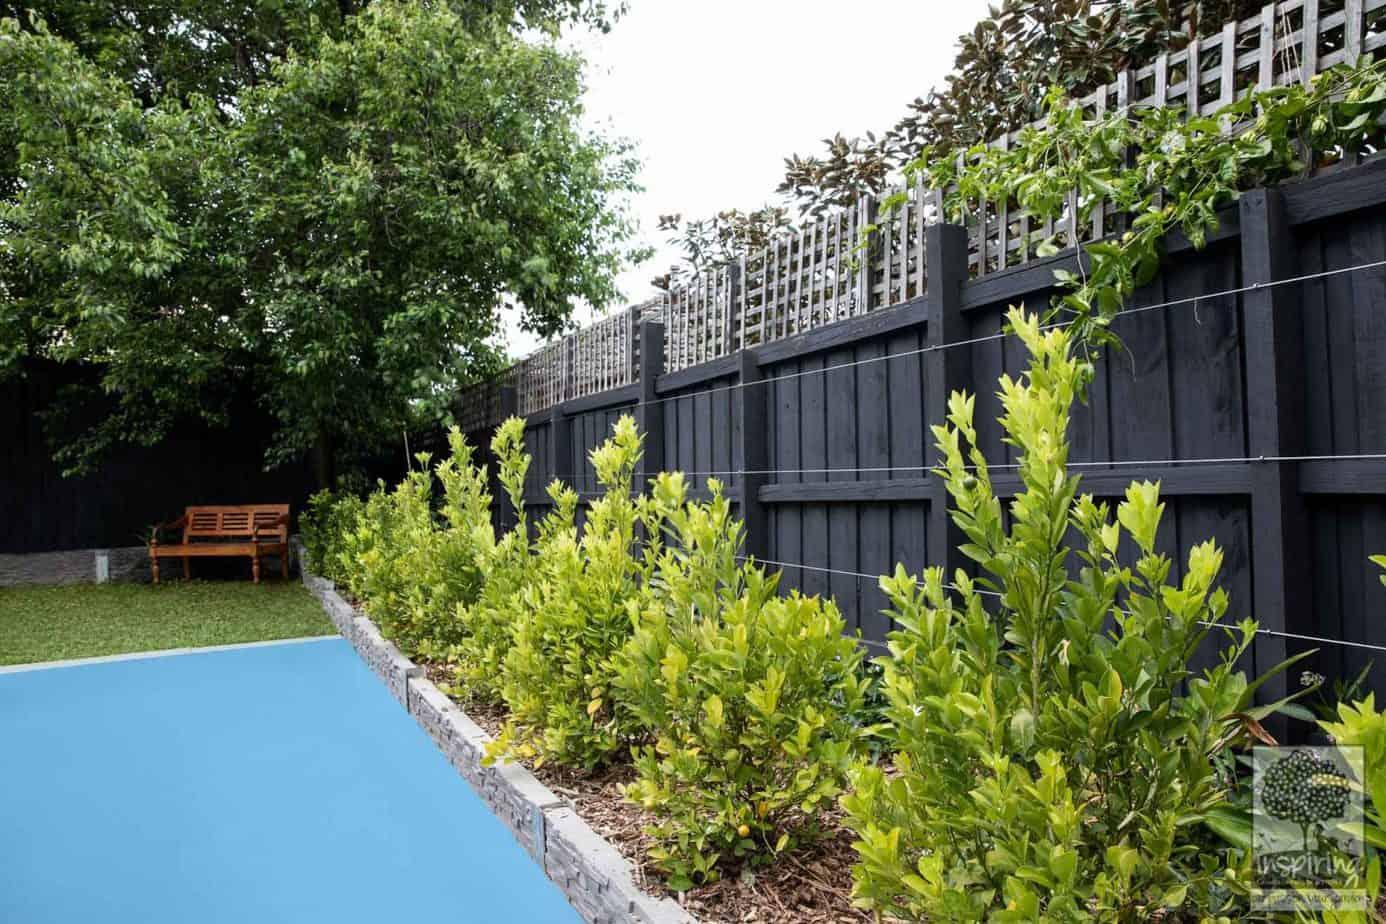 Edible garden design using a cumquat hedge in the backyard of a Camberwell property in Melbourne